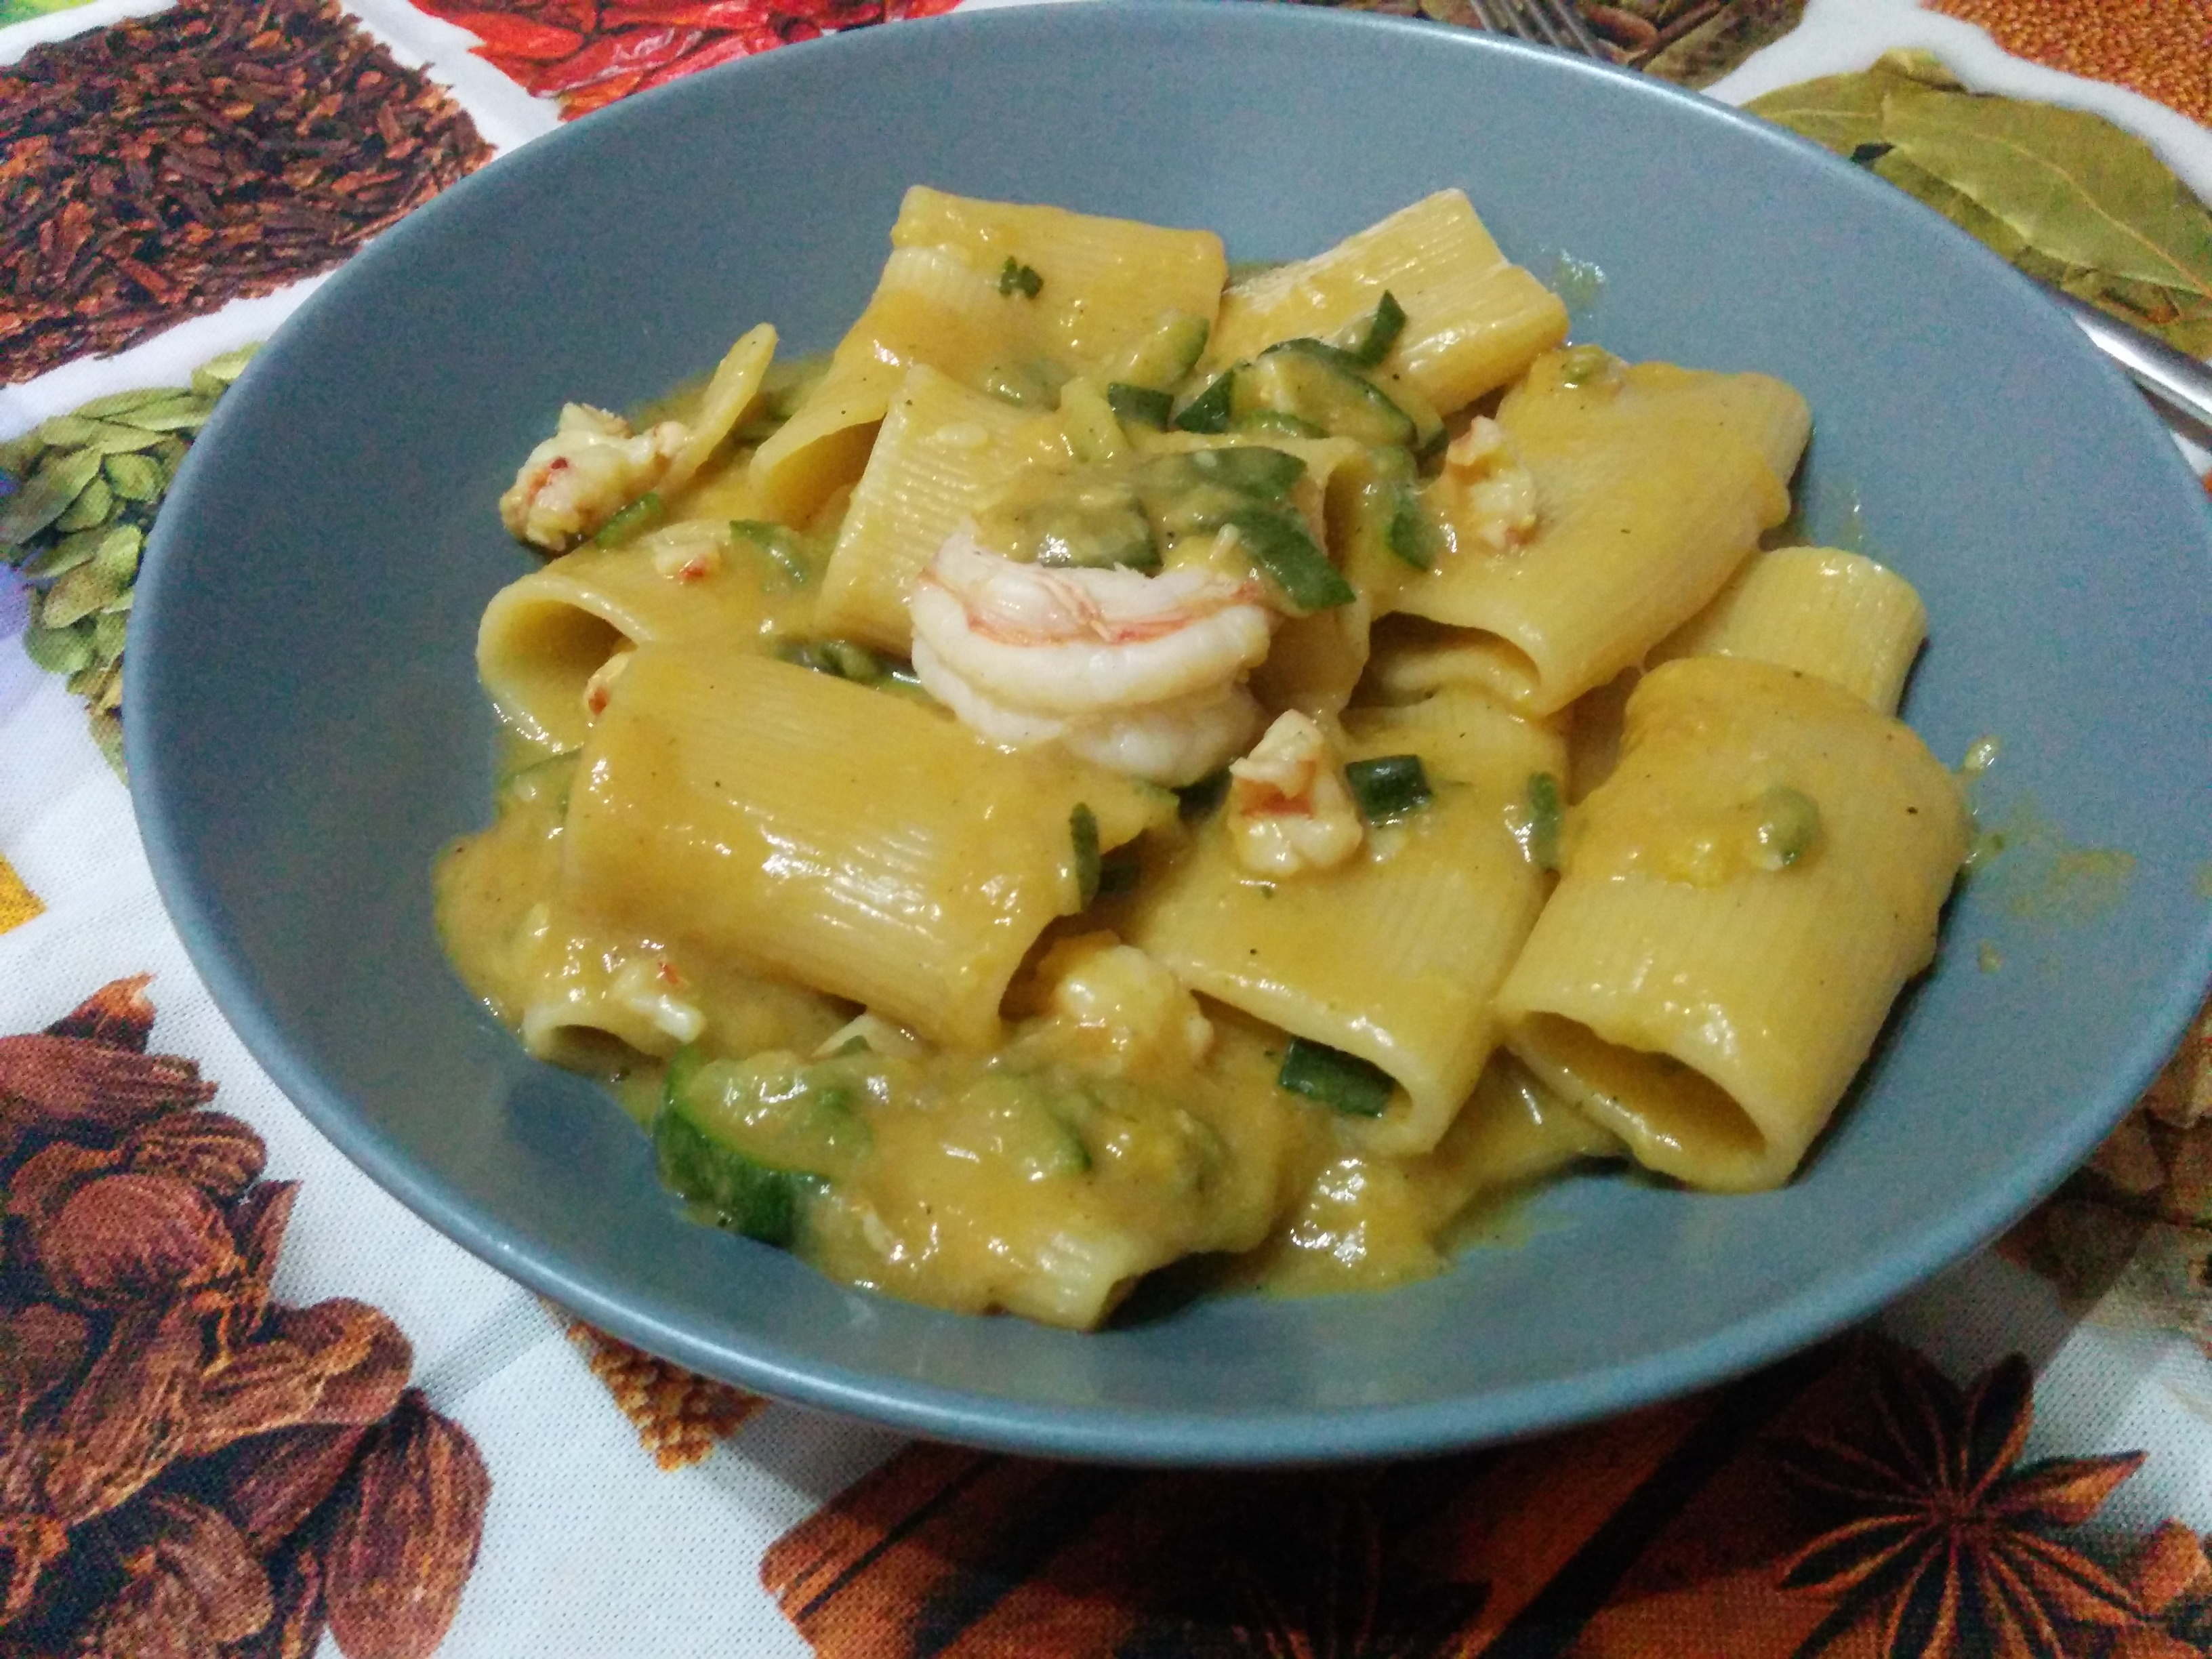 Paccheri gamberoni e zucchine